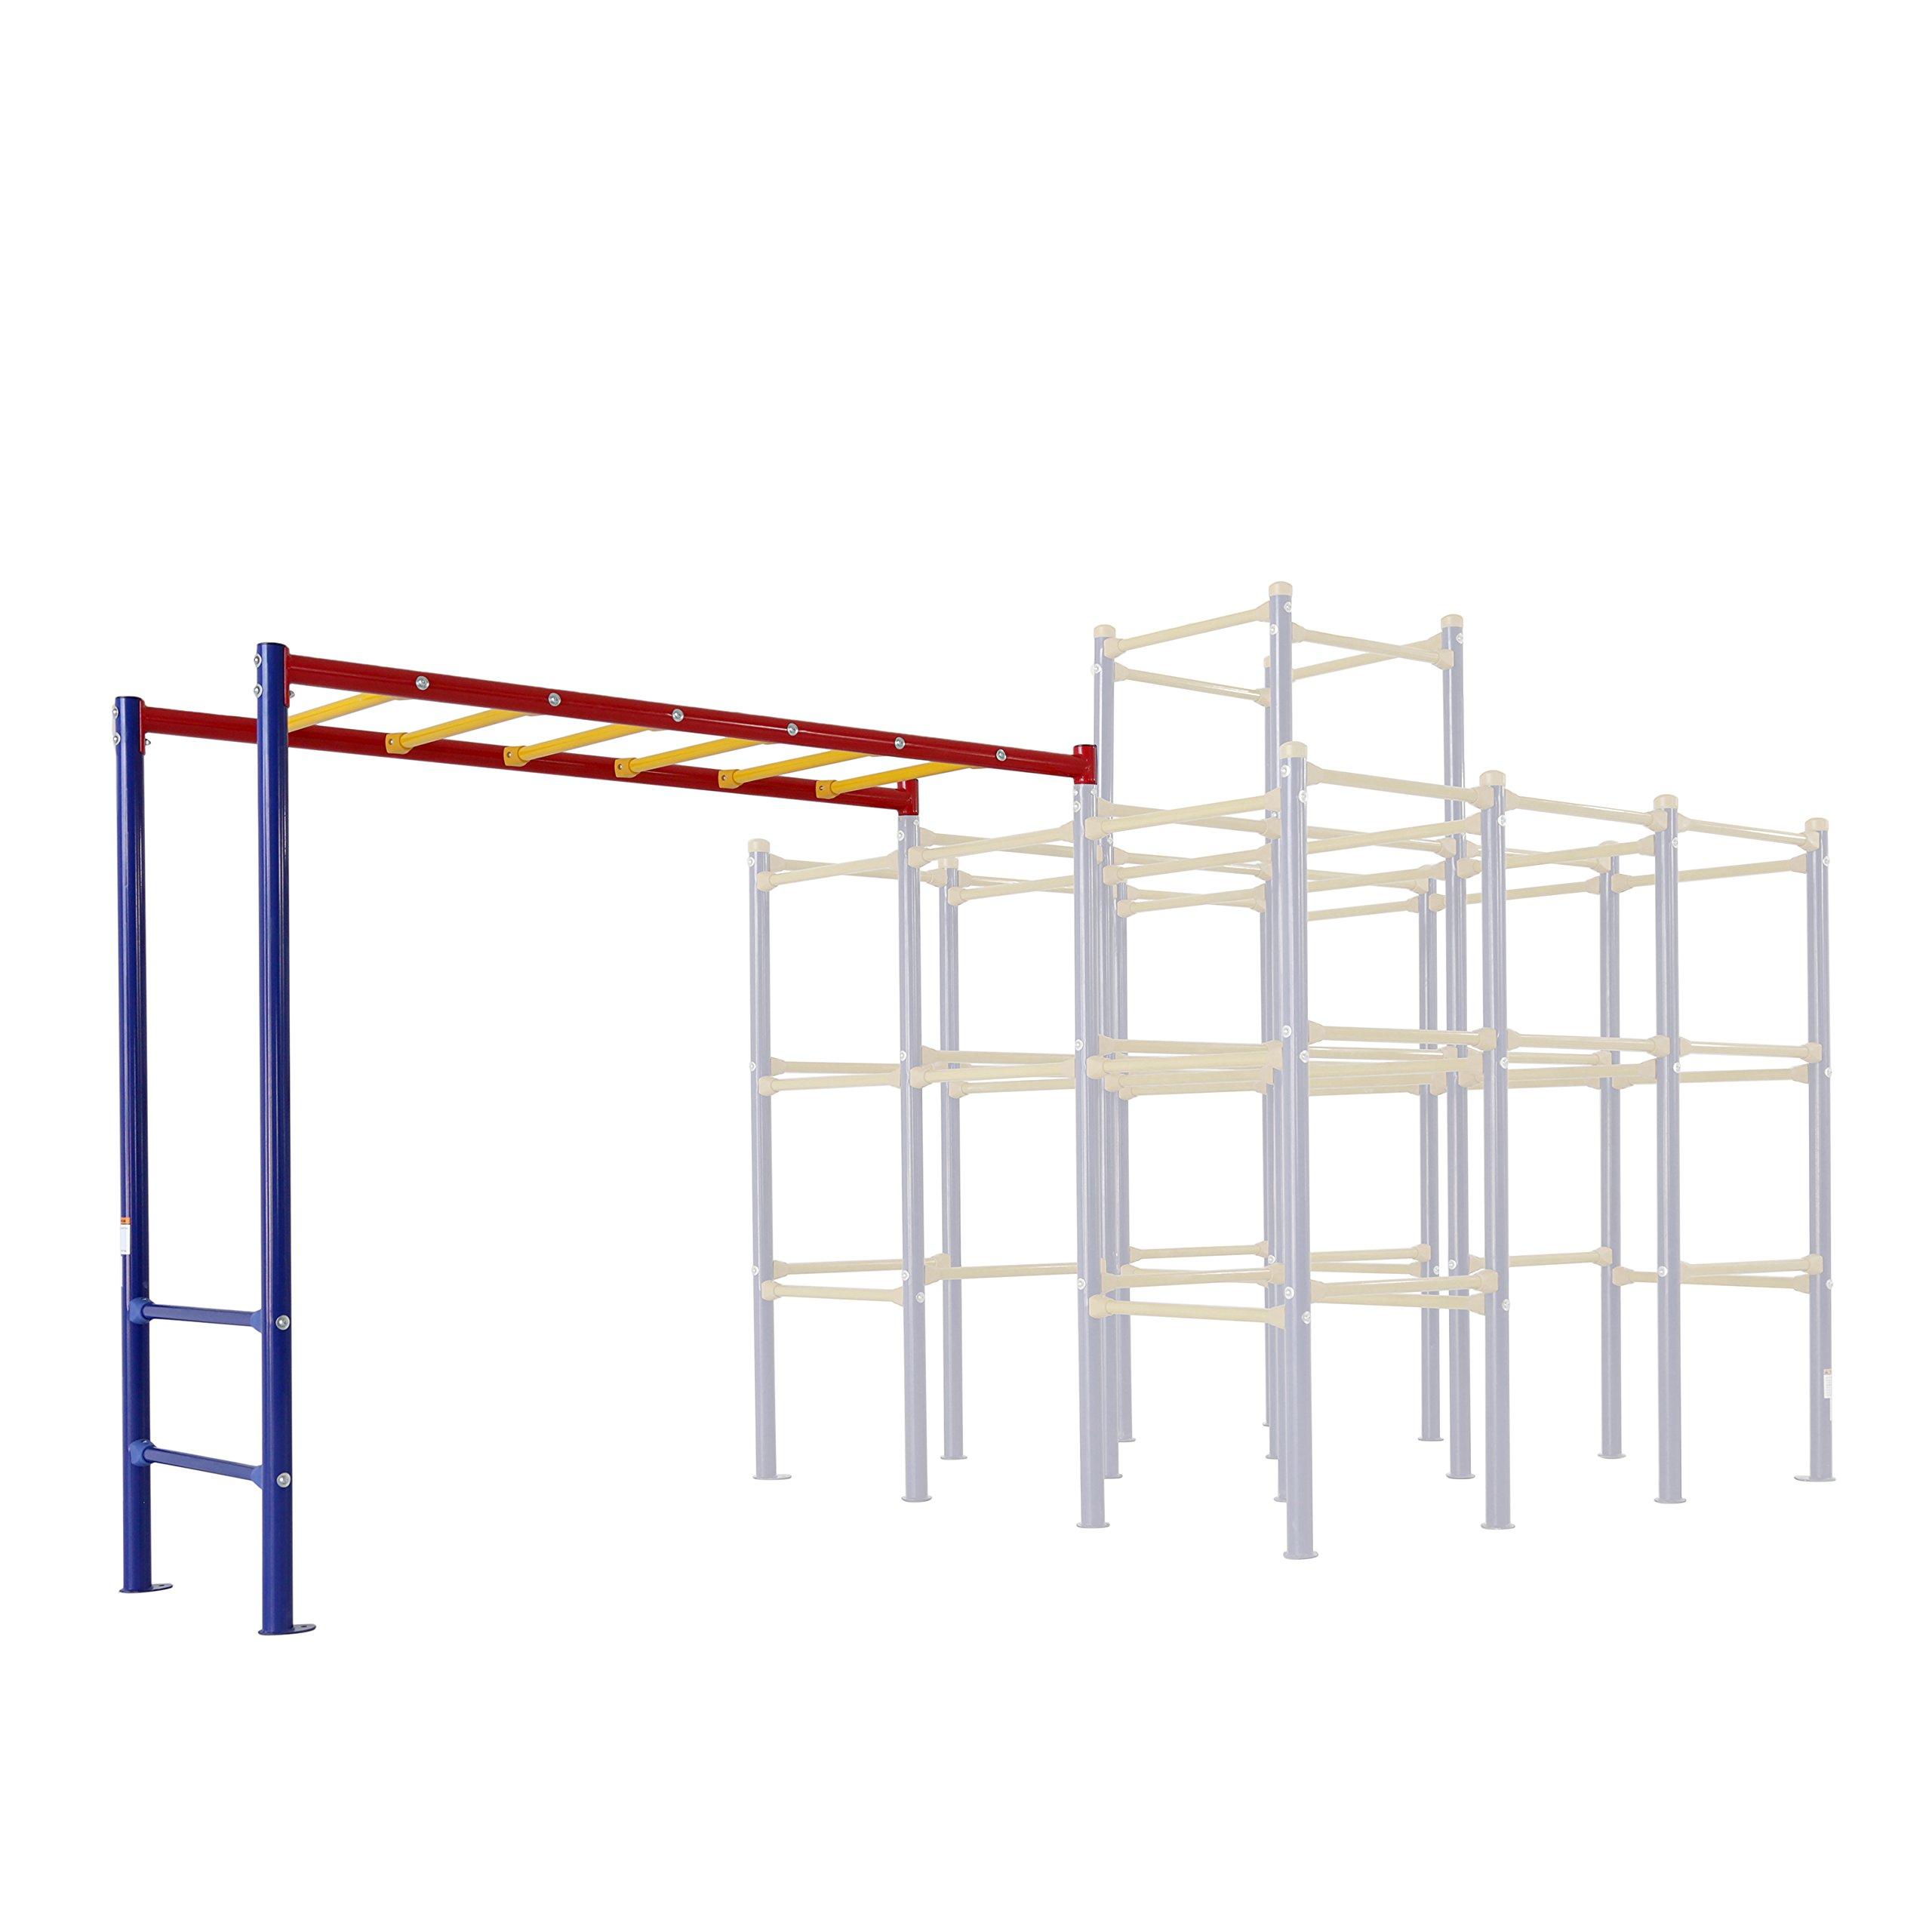 Skywalker Sports Monkey Bars Module, Requires Jungle Gym (Model SJG200)